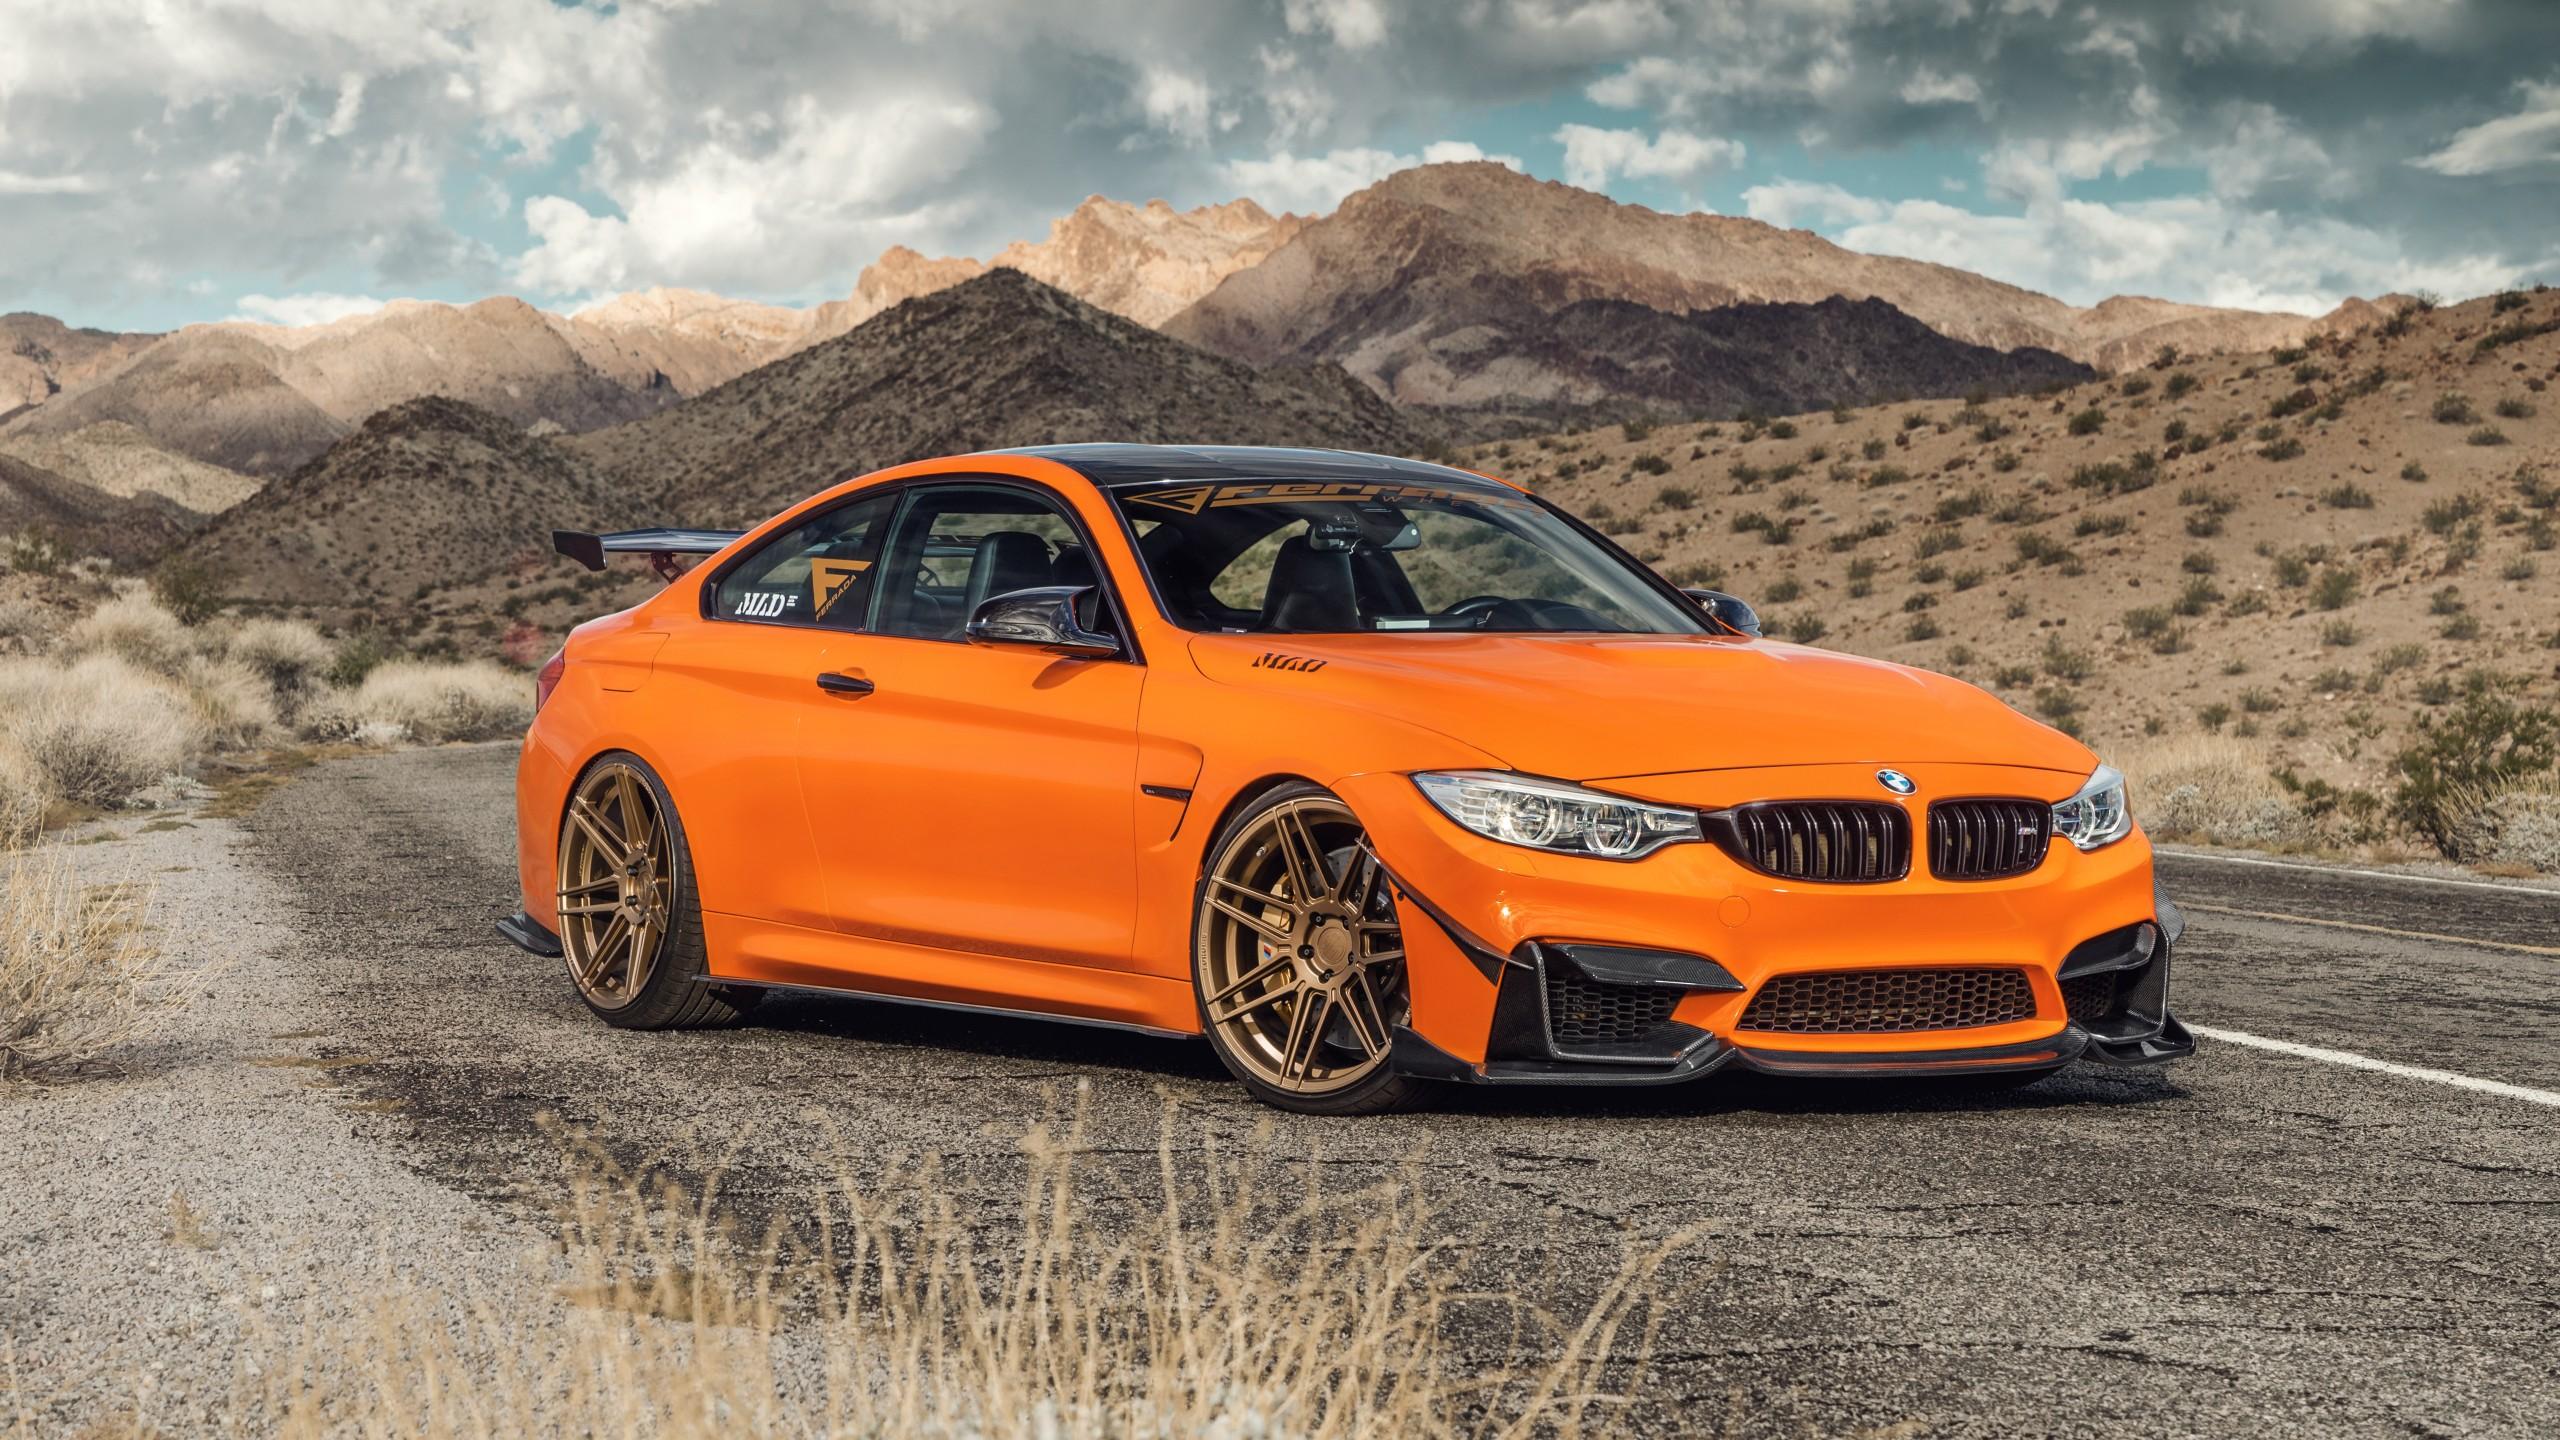 Bmw M Wallpaper Iphone X Ferrada Sema Orange Bmw M4 5k Wallpaper Hd Car